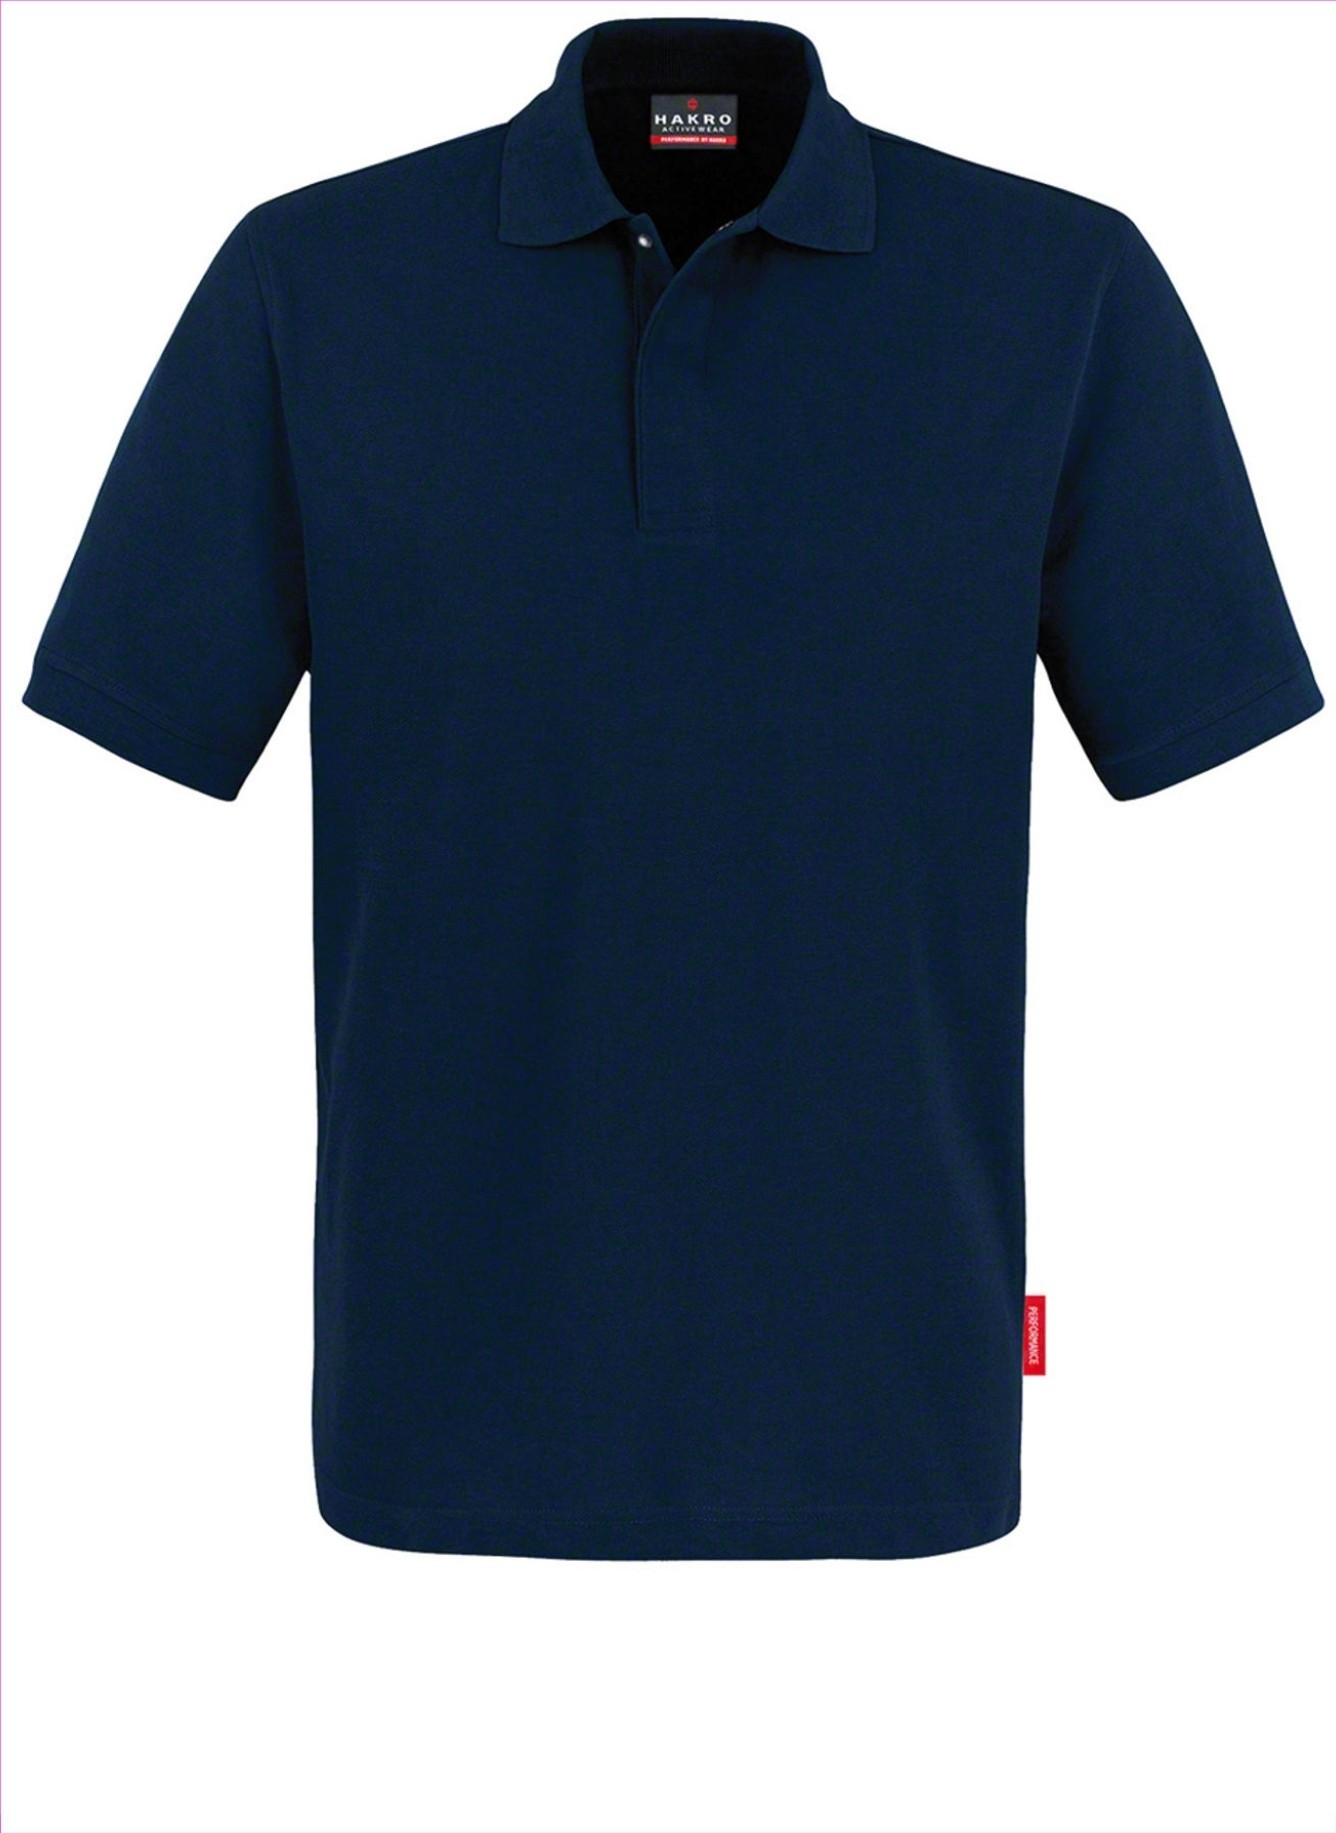 HAKRO Poloshirt HACCP Performance Unisex